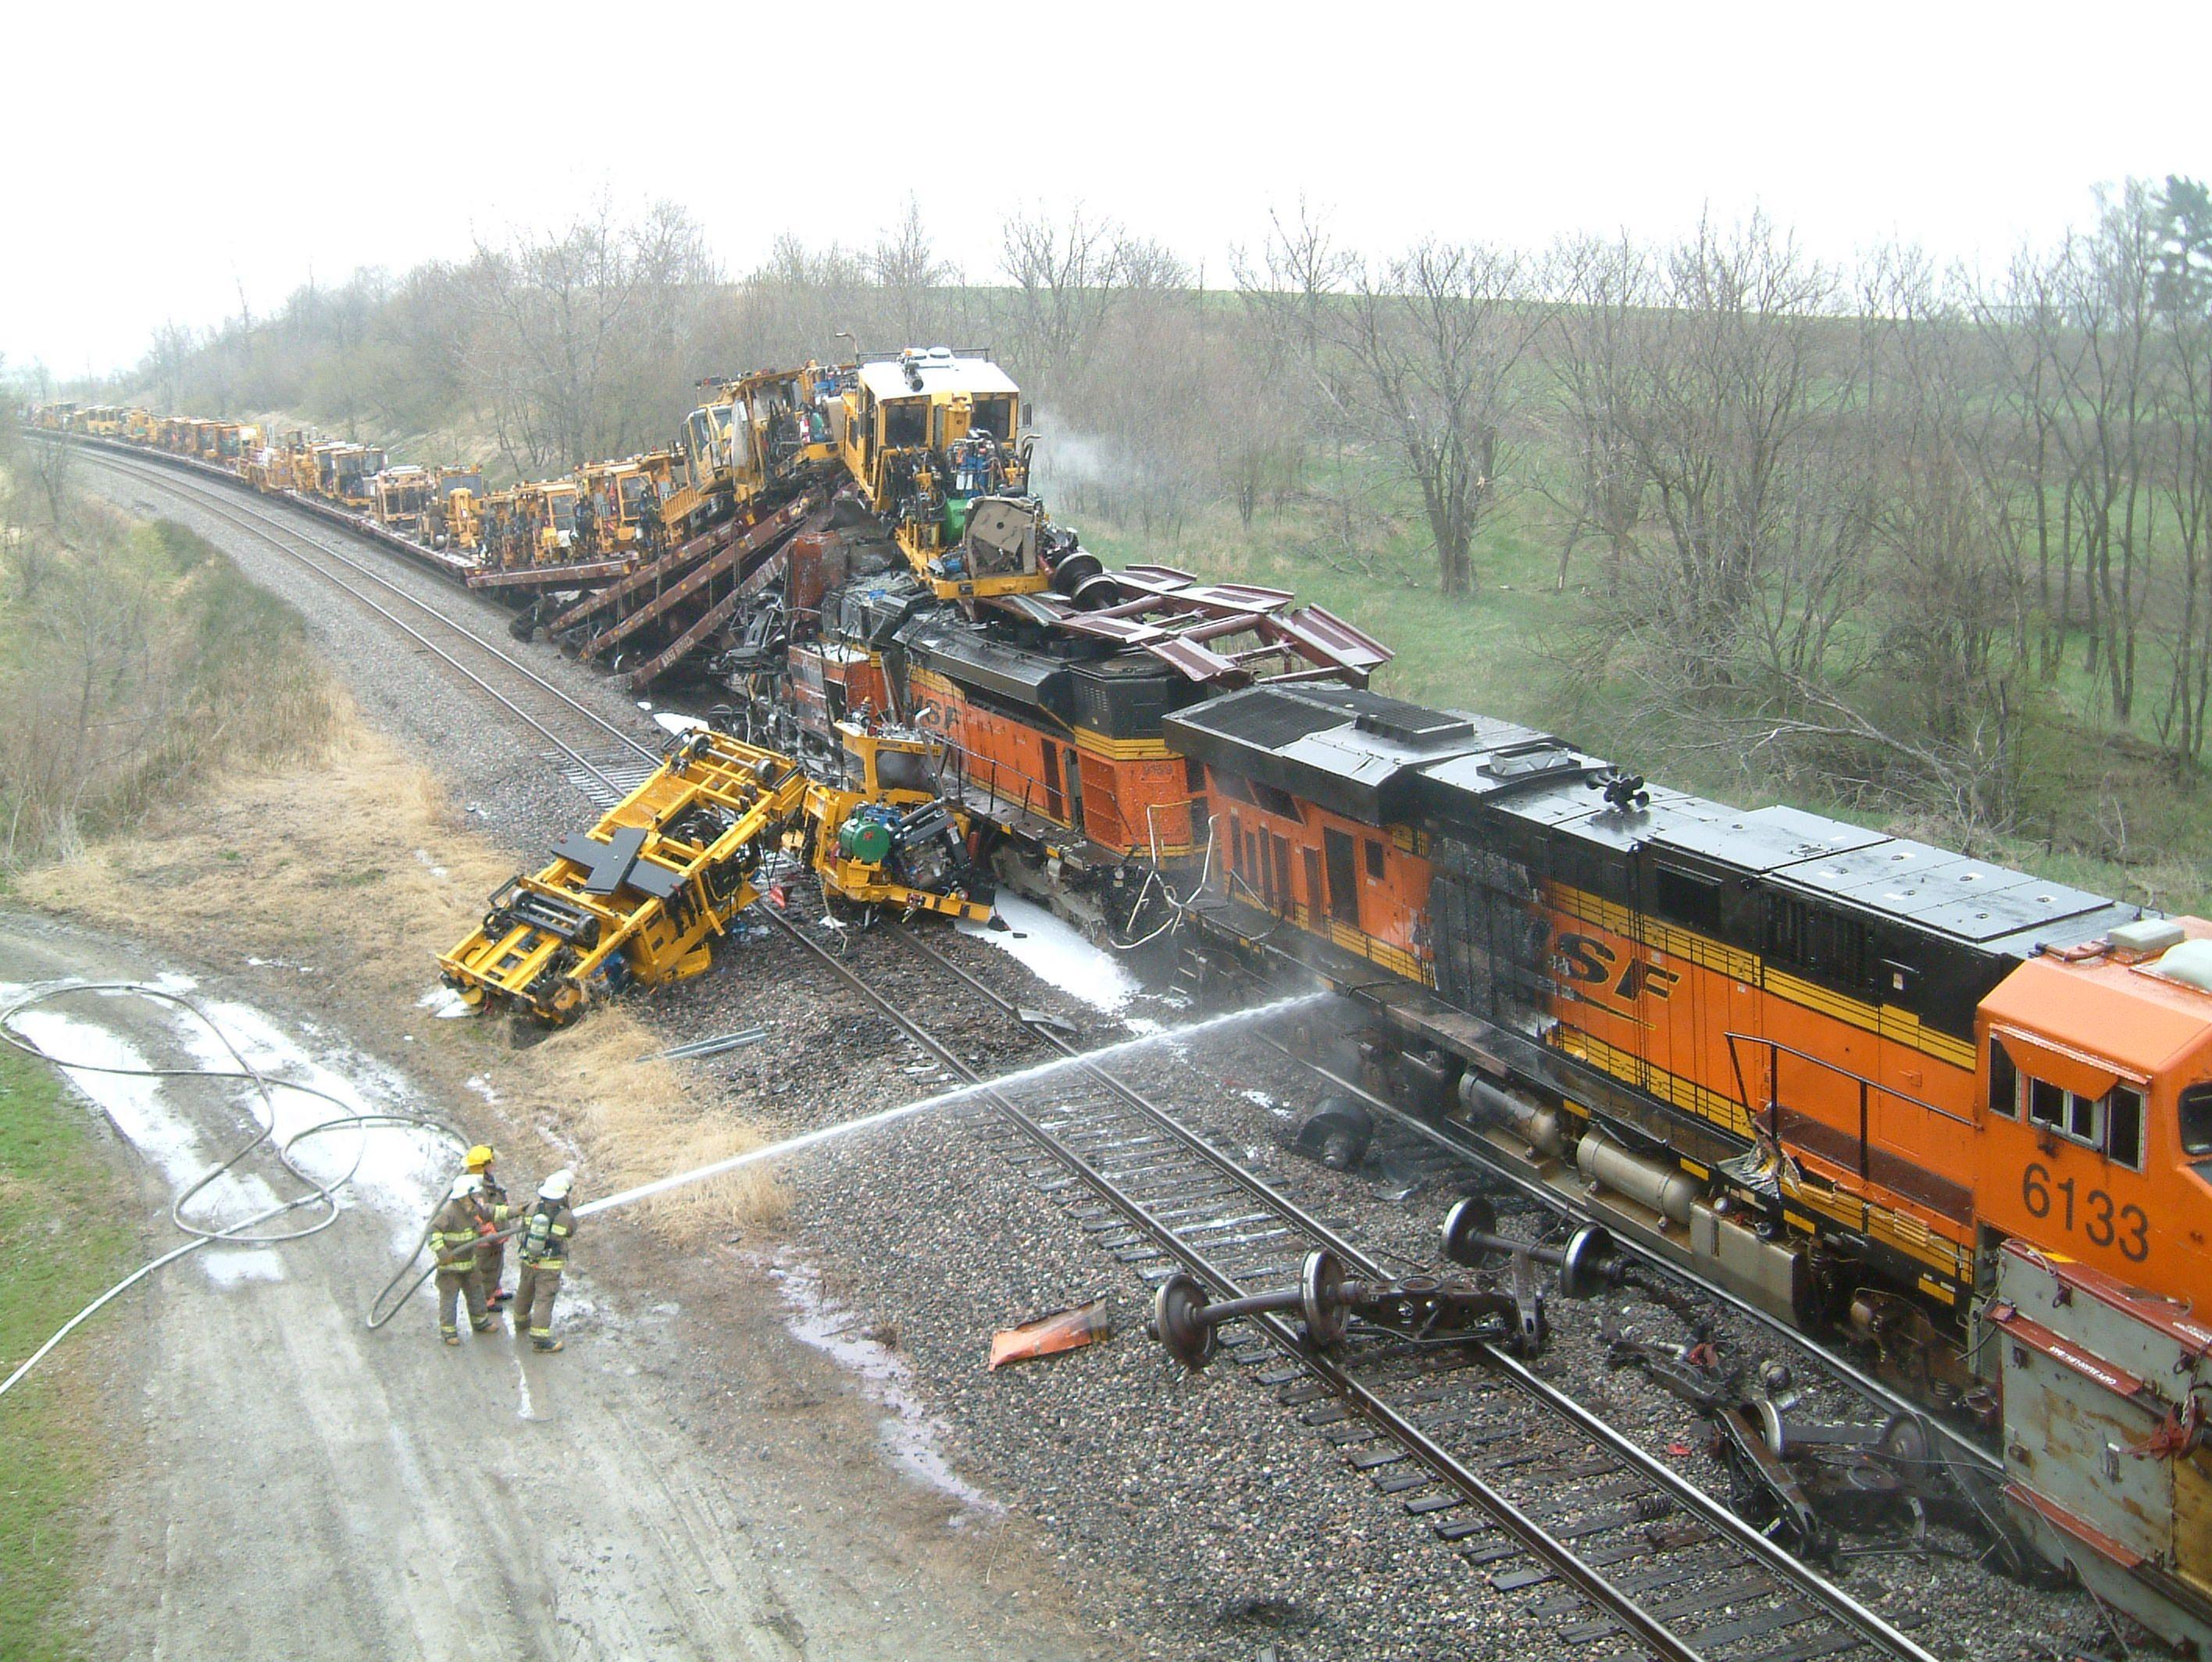 L.I.R.R. Accident: How a Hazardous Rail Crossing Became a ...  |Rail Road Train Wreck